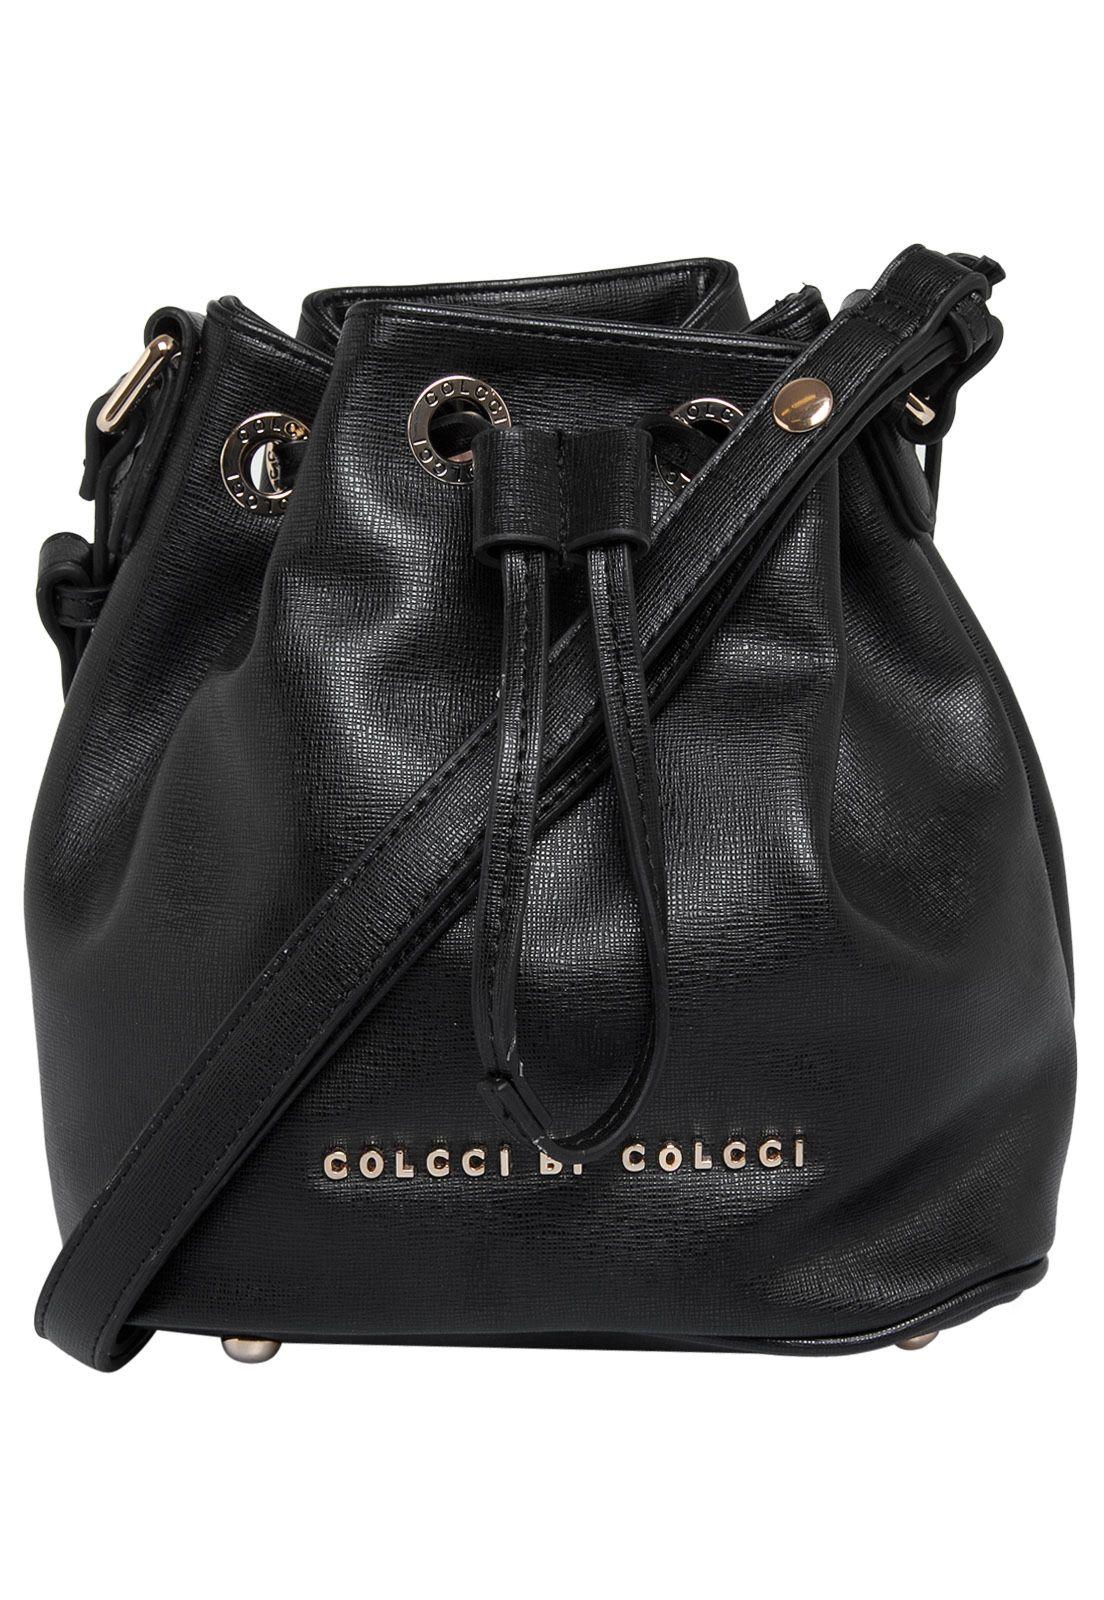 ff9164062 Bolsa Colcci Cordão Preta | Colcci | Bags, Fashion bags e Fashion